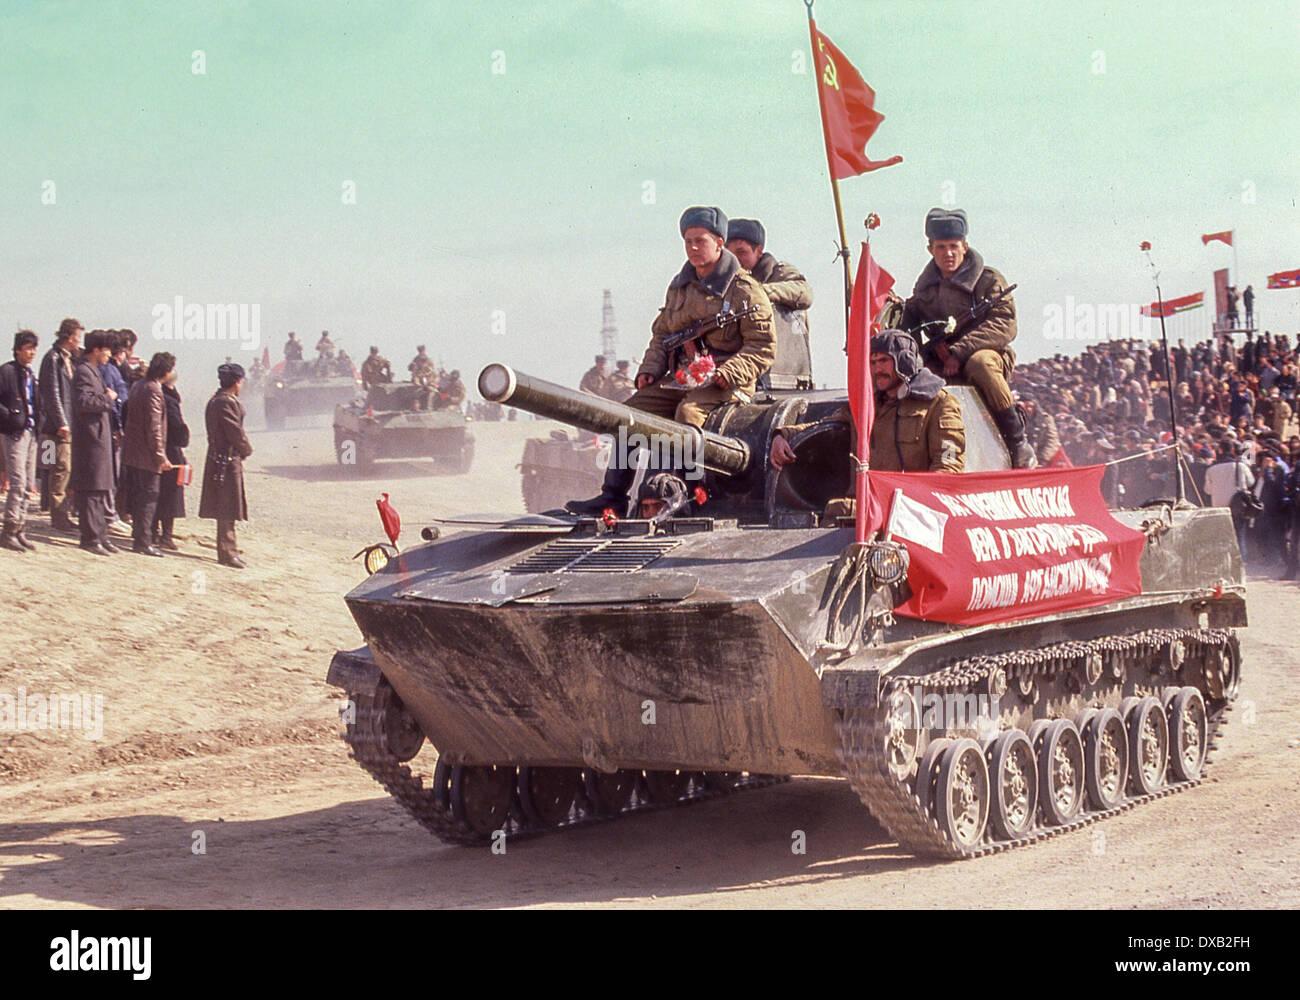 Soviet Afghanistan war - Page 6 Feb-17-1989-termez-uzbekistan-ru-a-light-tank-with-soviet-troops-of-DXB2FH